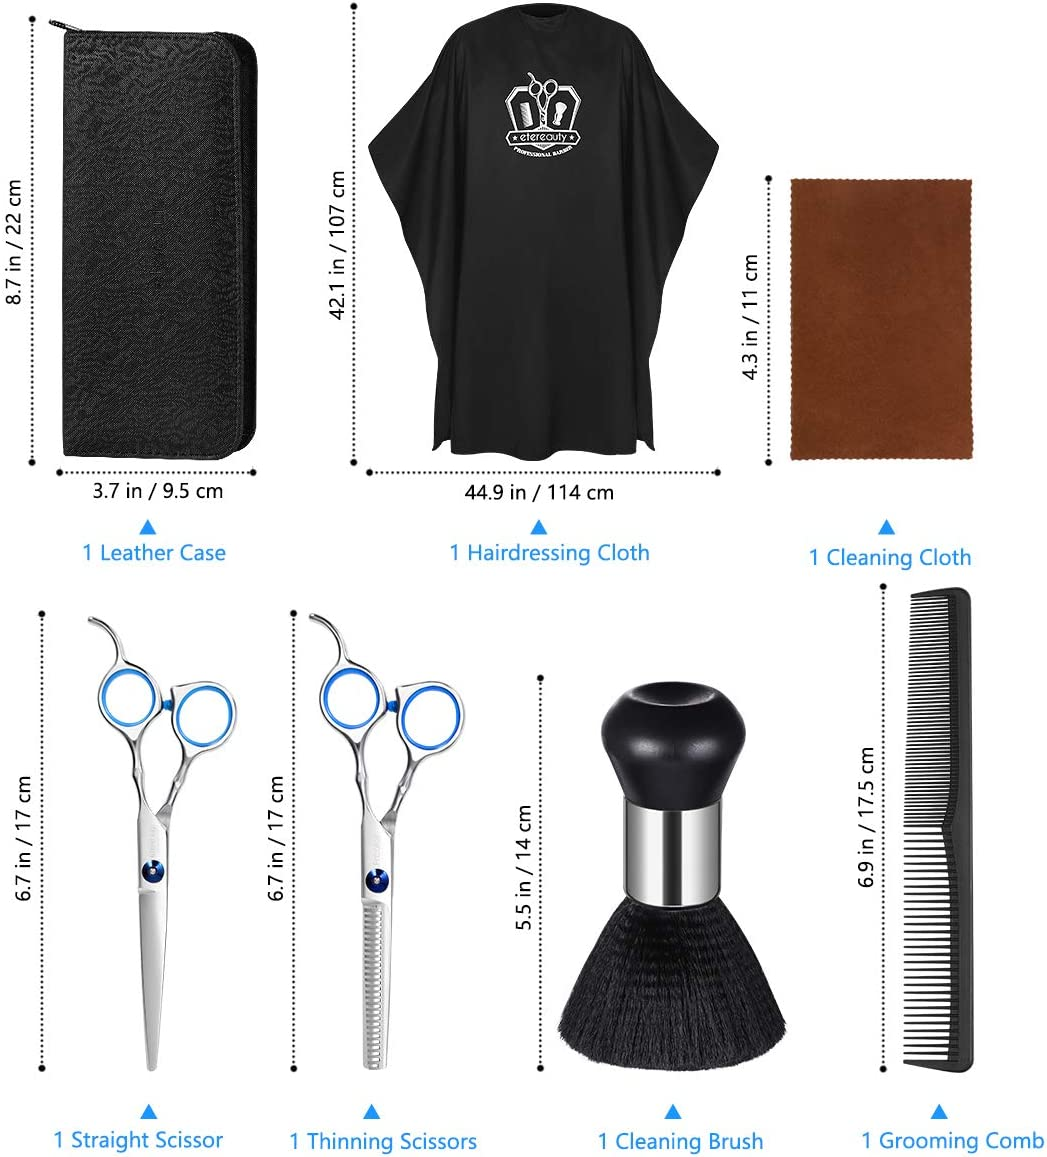 Hair Cutting Scissors Shears, Professional Barber Scissors Stainless Steel Thinning Shears Hairdressing Shears Kit, 7PCS